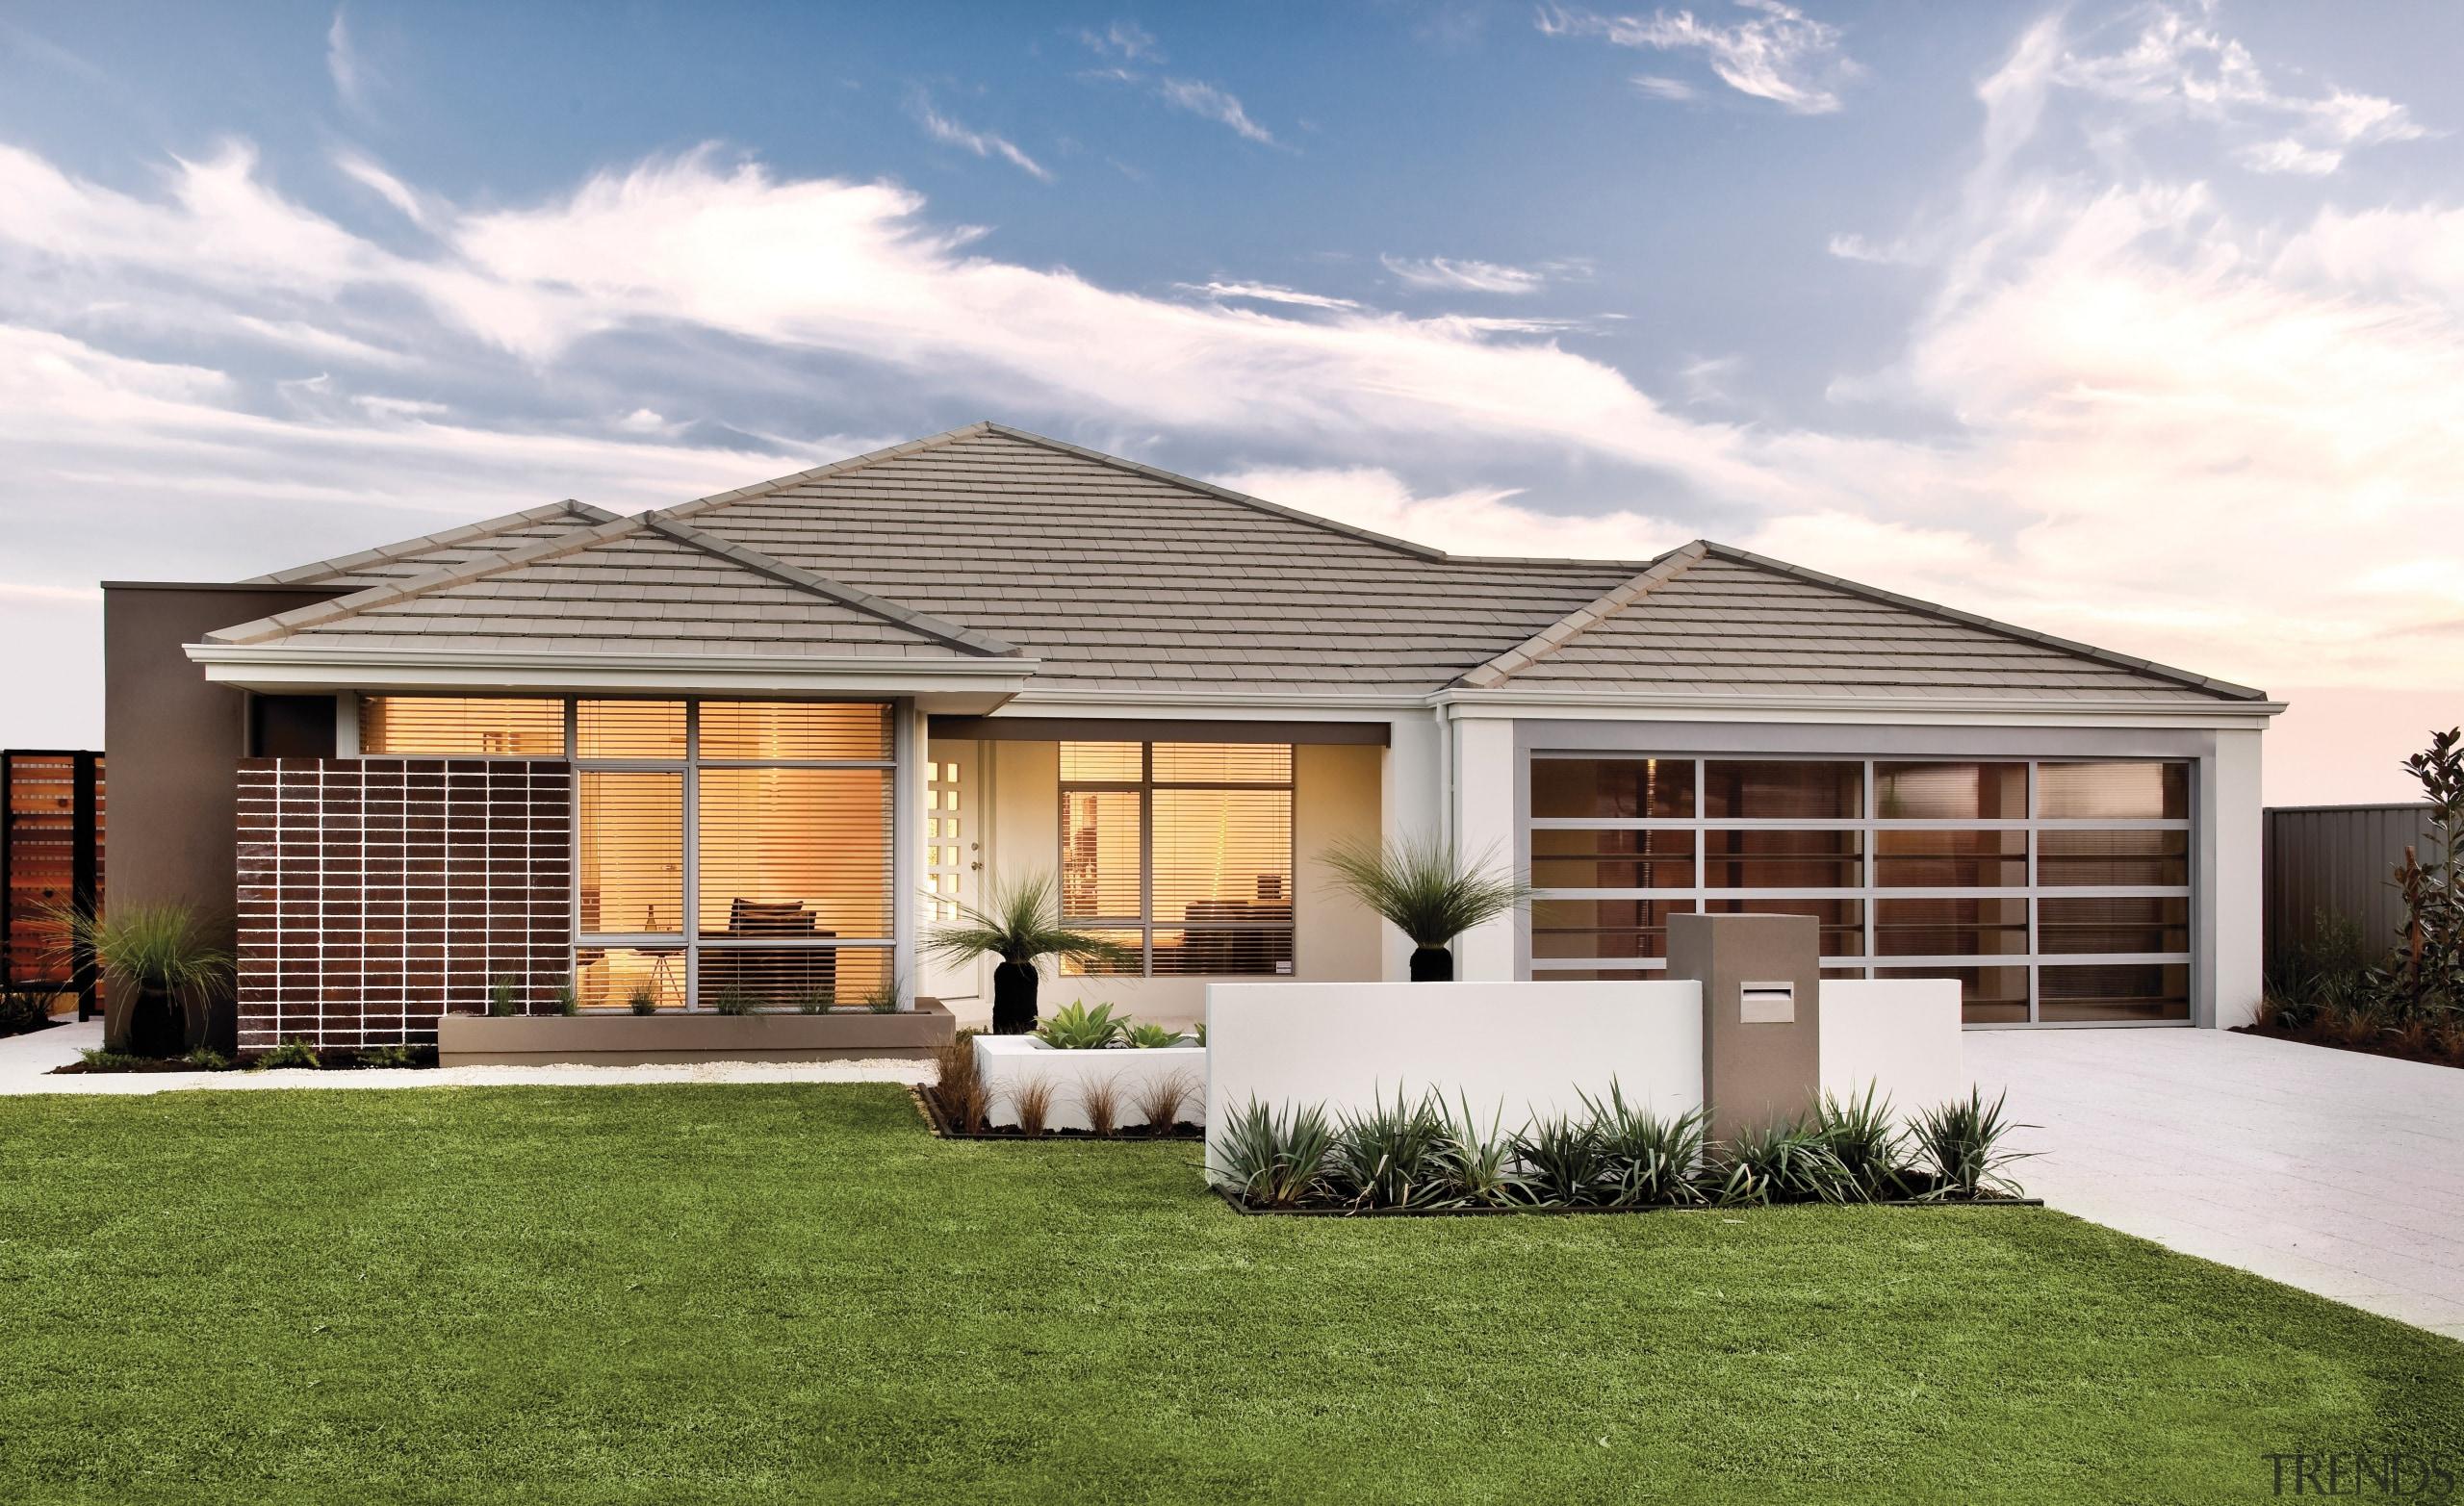 Monier Concrete Tiles - Horizon - Monier Concrete backyard, cottage, elevation, estate, facade, home, house, property, real estate, residential area, roof, siding, yard, brown, white